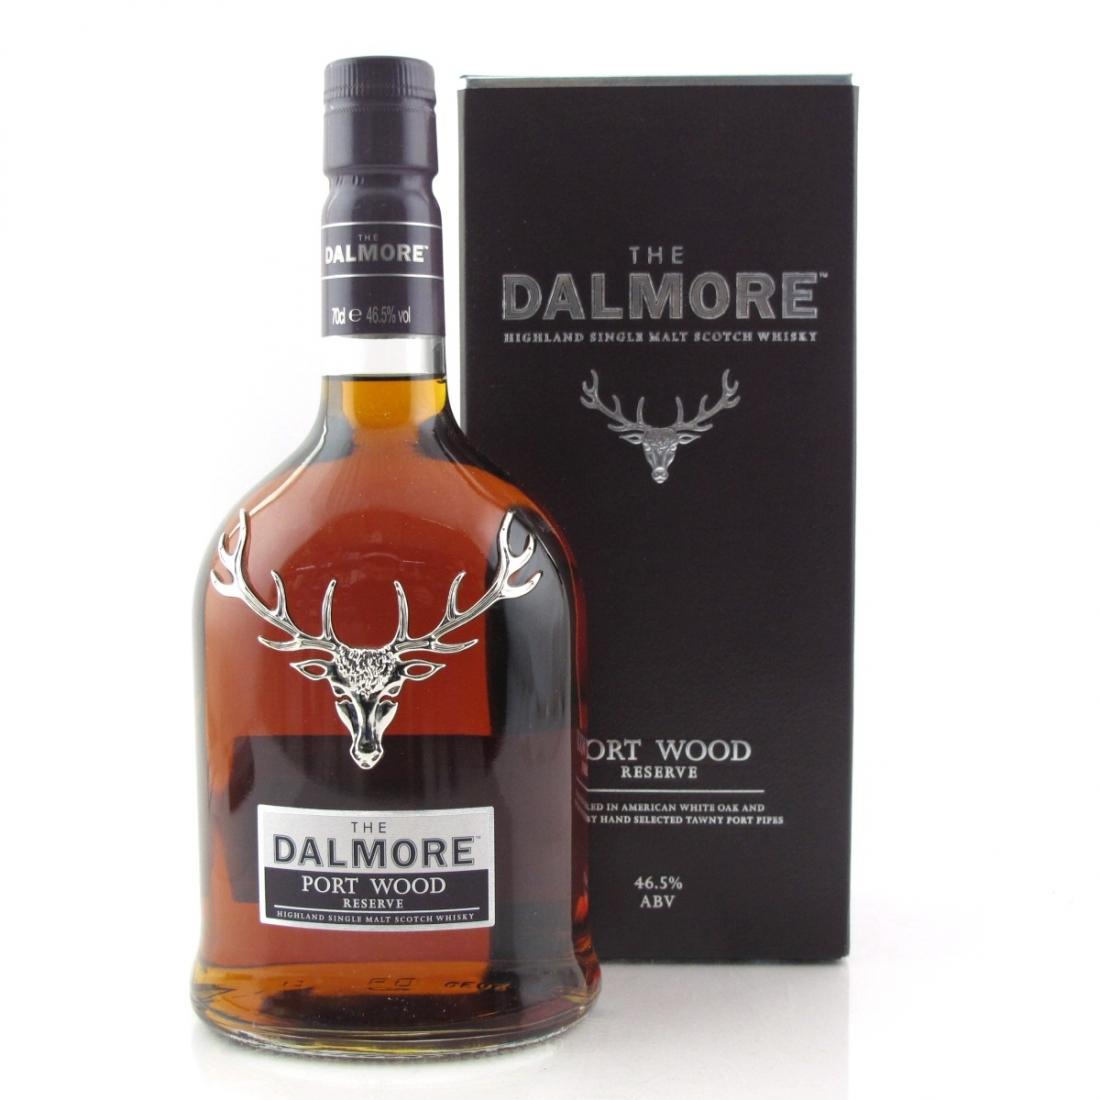 Dalmore Port Wood Reserve